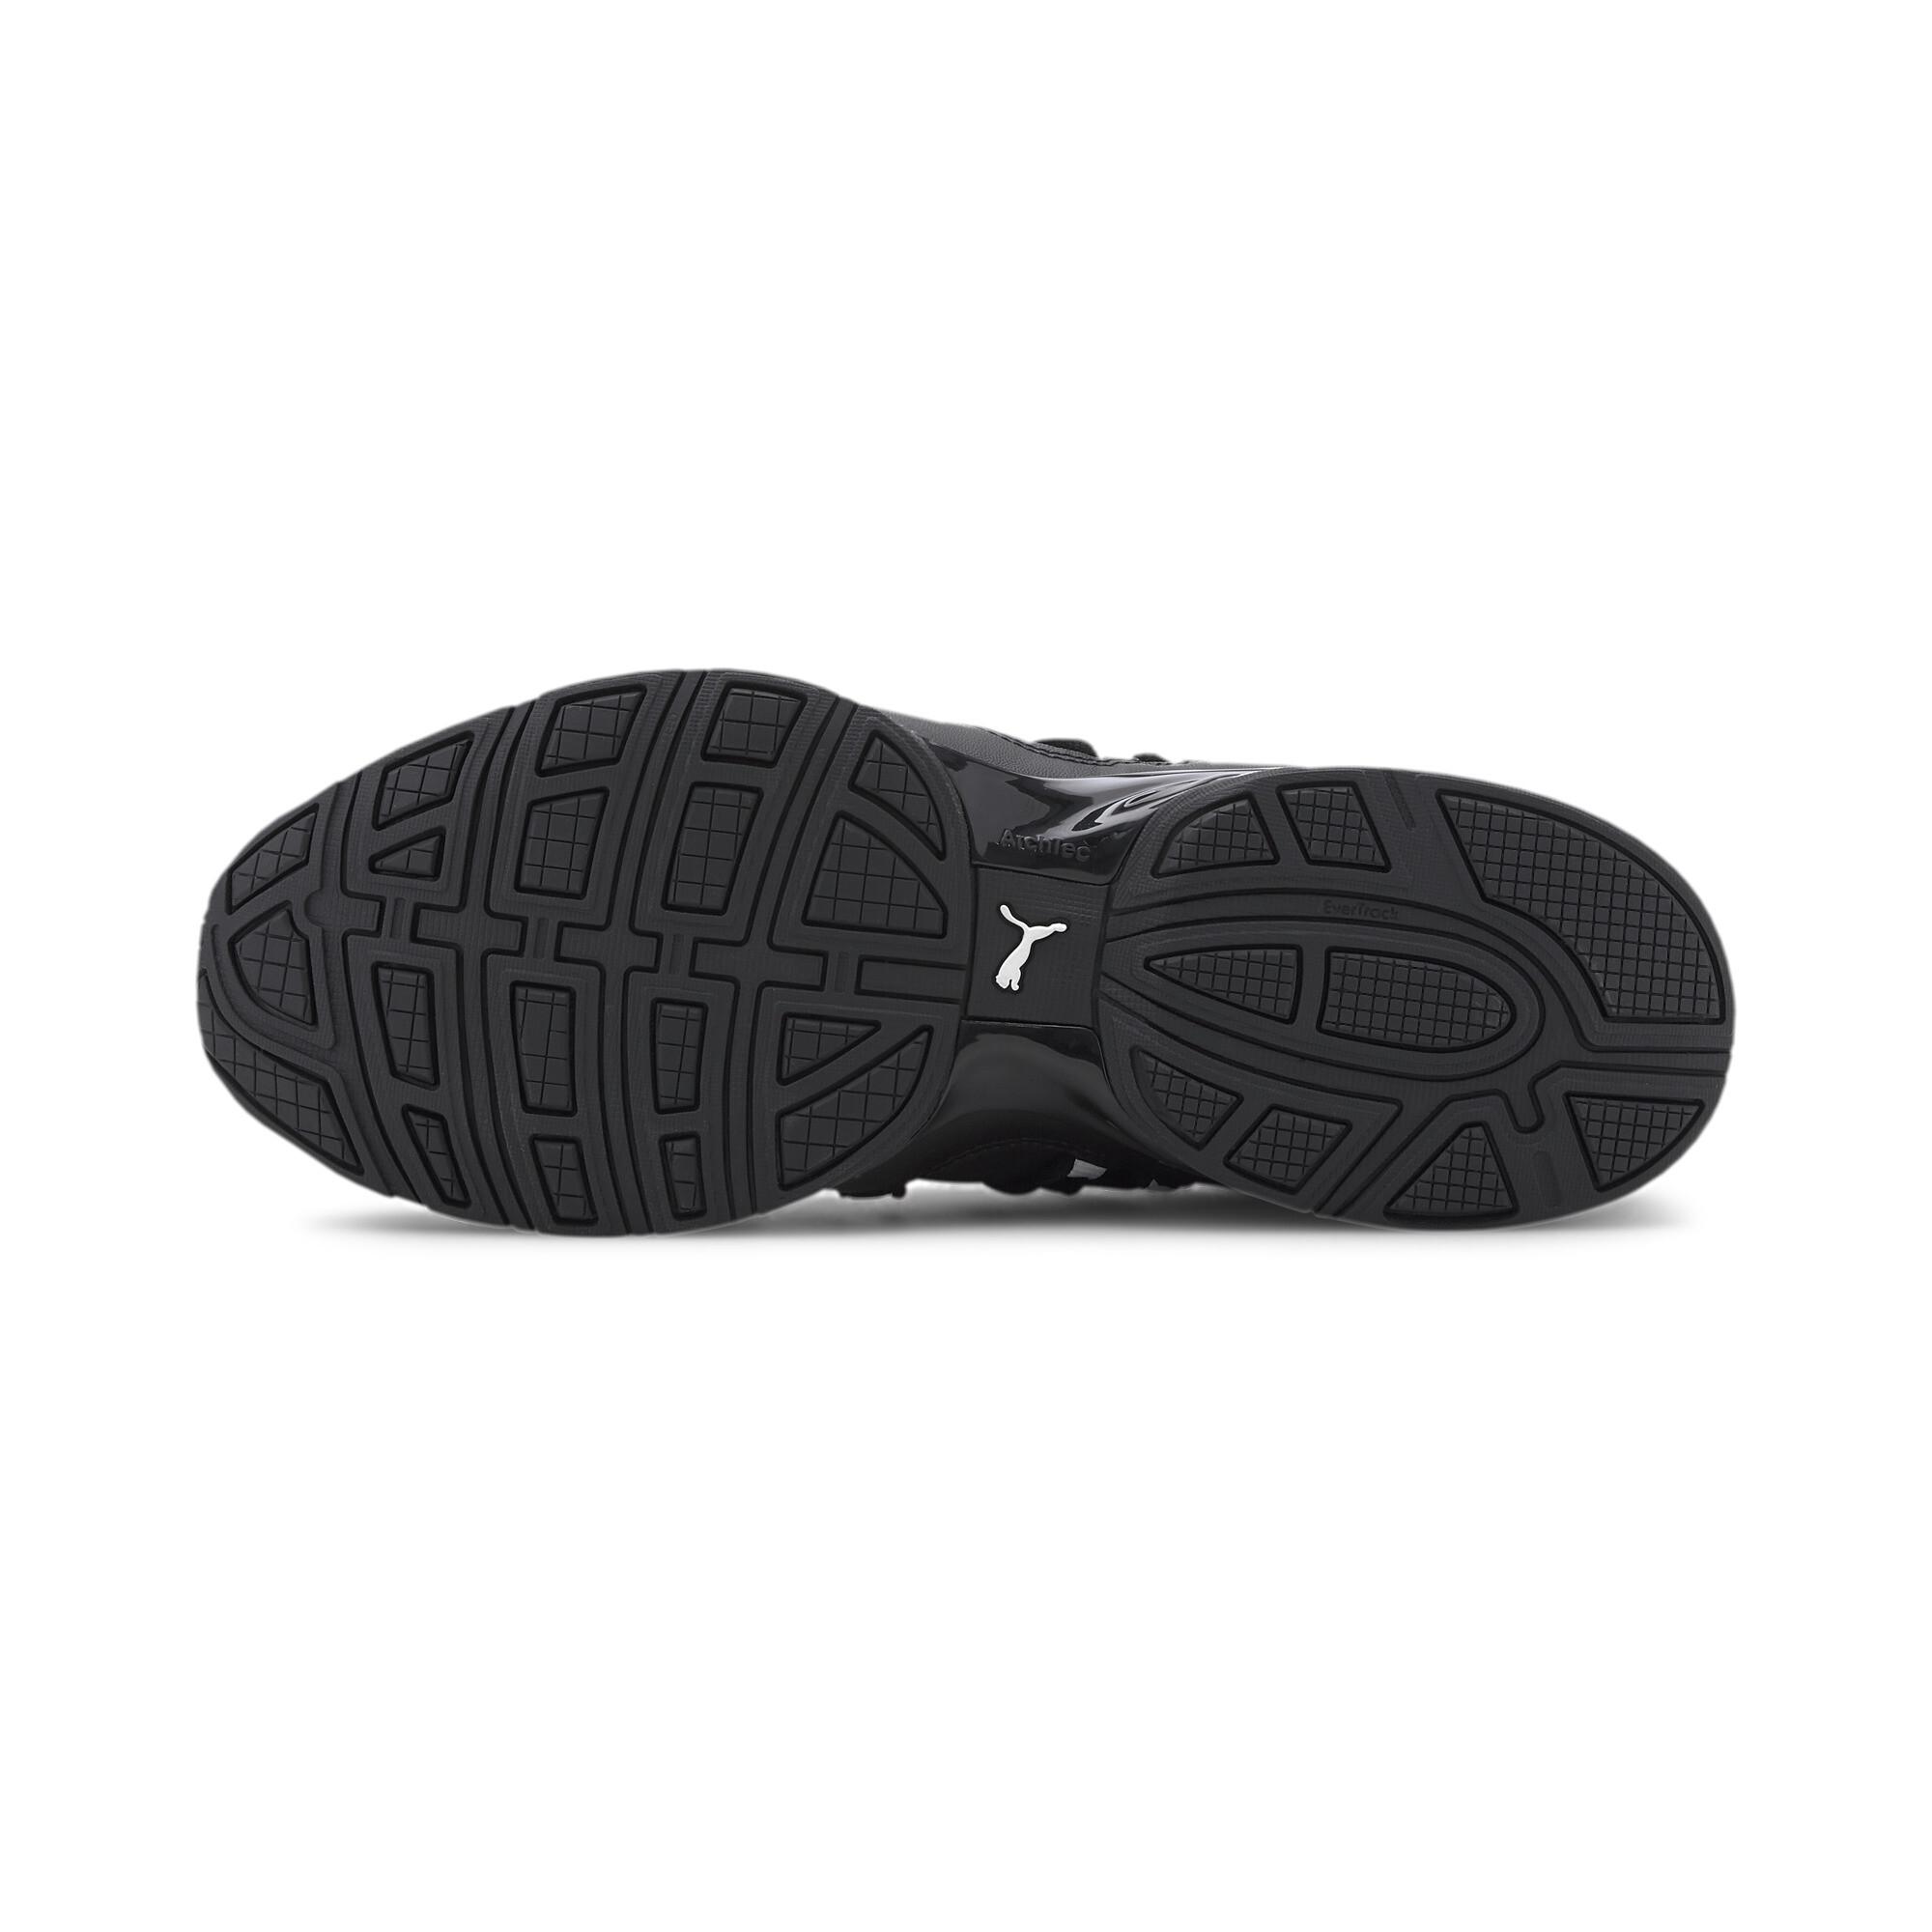 PUMA-Silverion-Men-s-Running-Shoes-Men-Shoe-Running thumbnail 11